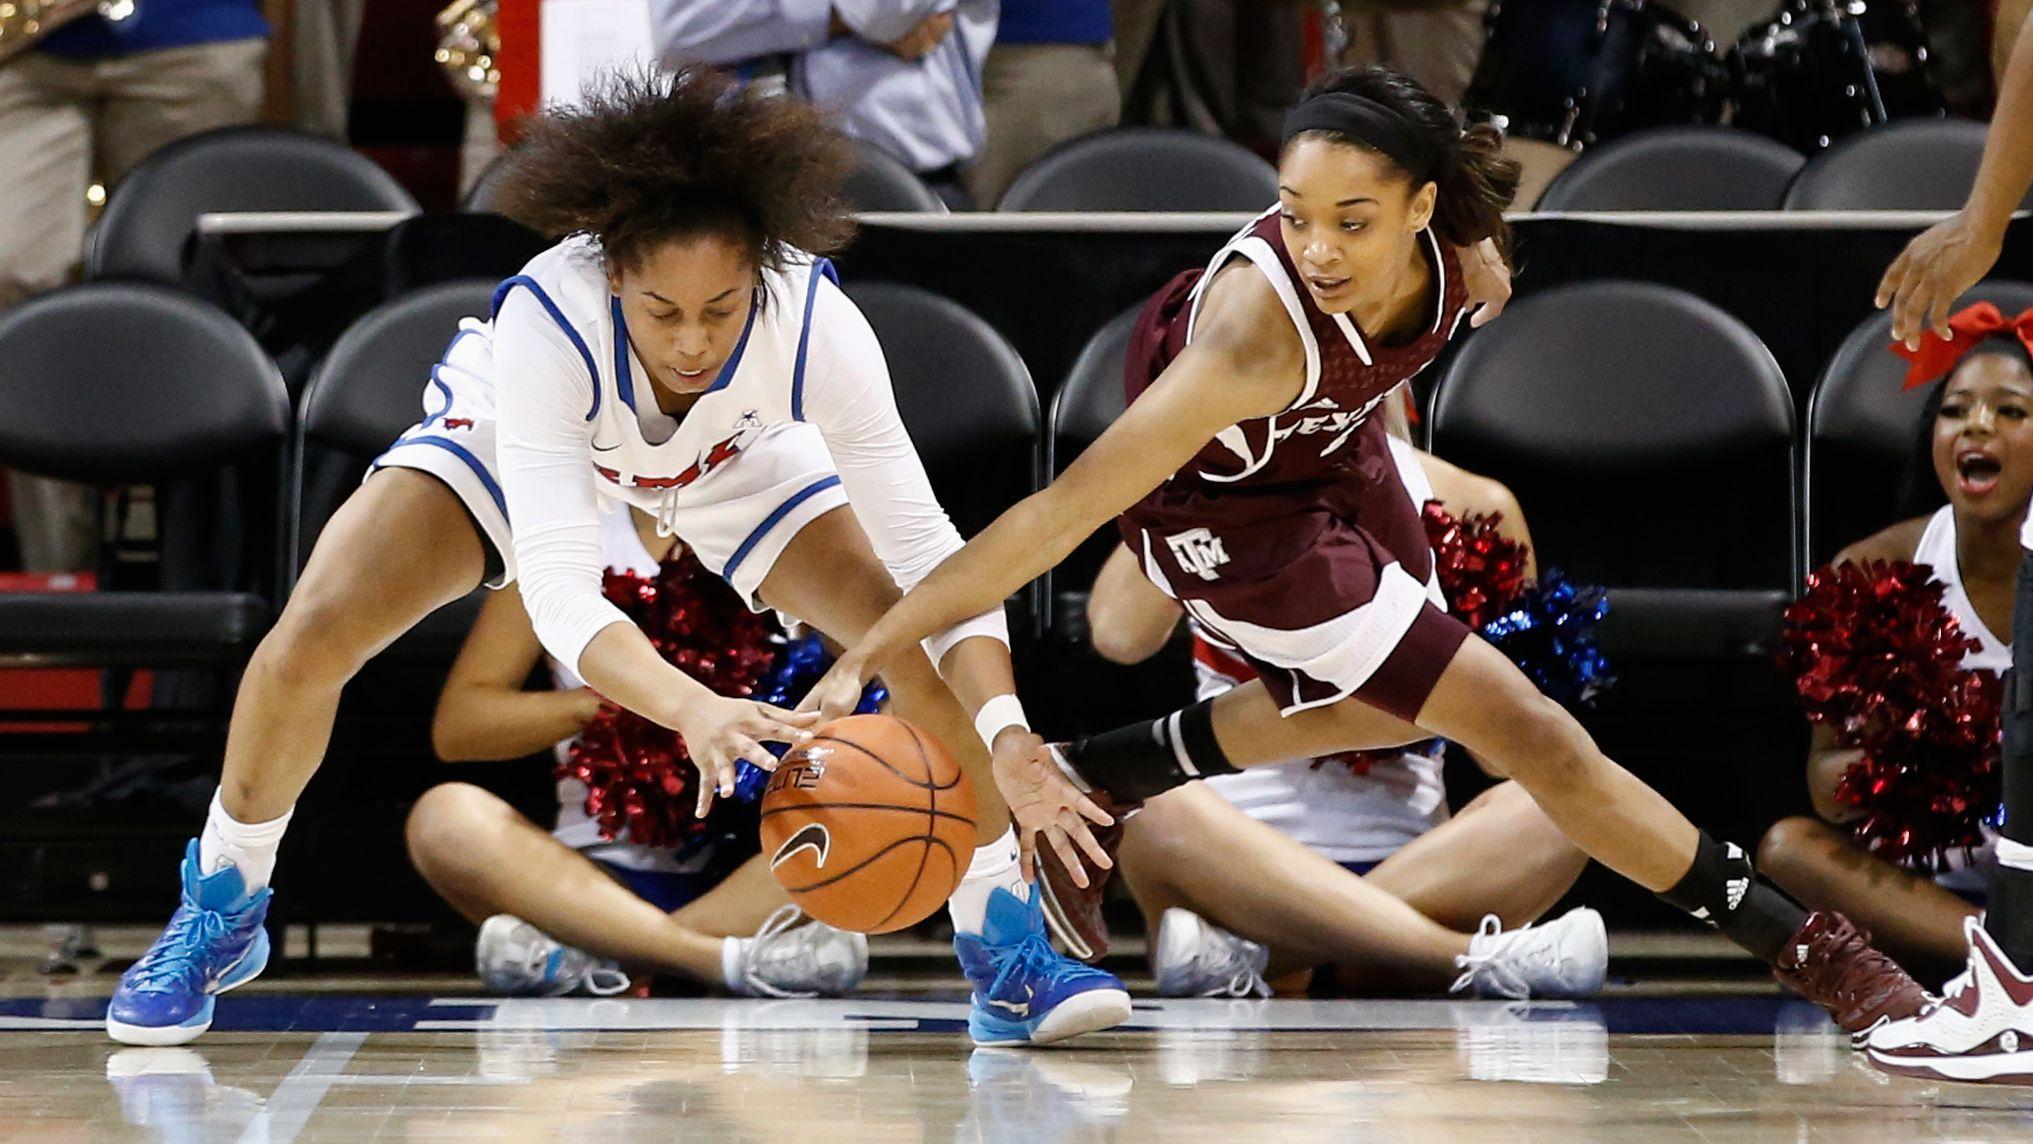 SEC vs. Big 12 women's basketball challenge